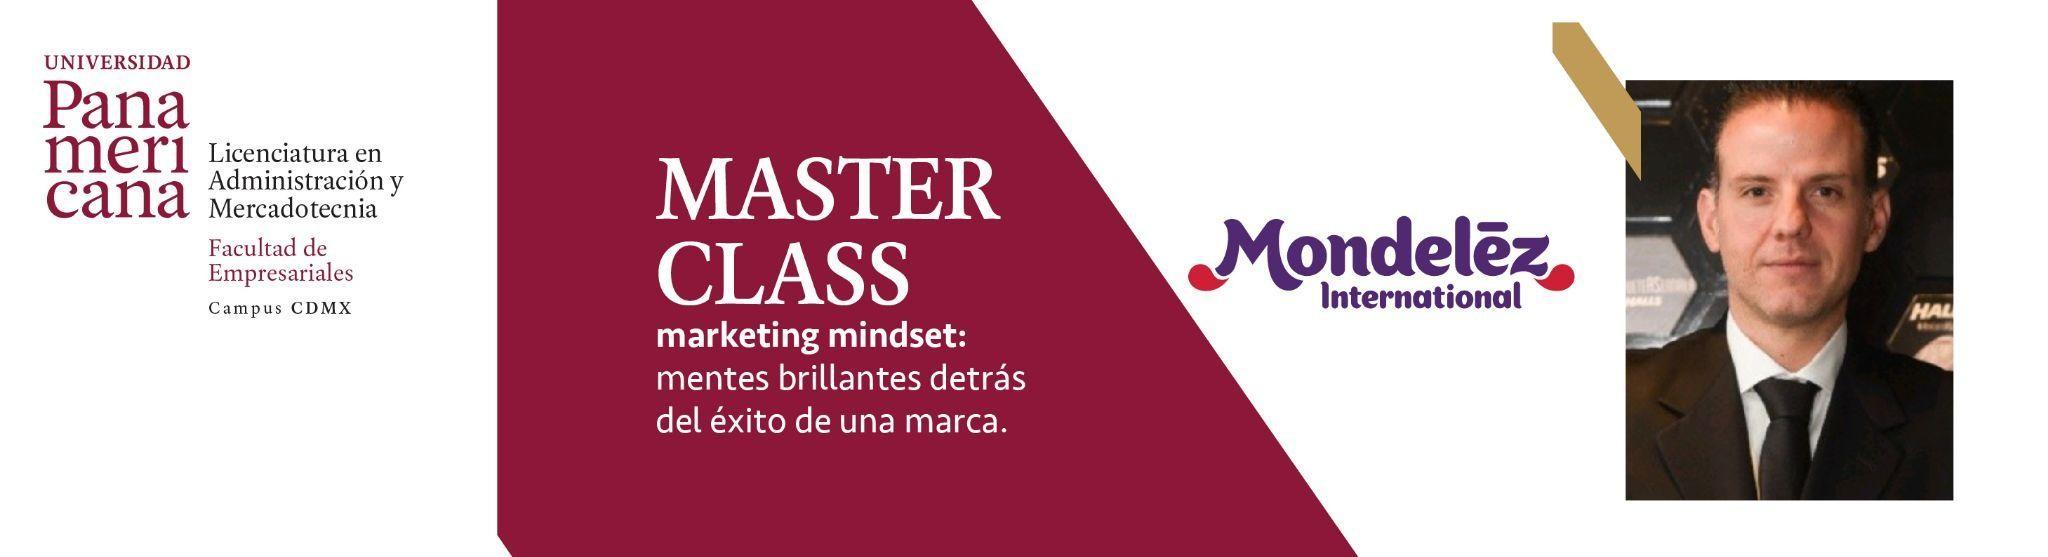 master-class-marketing-mindset